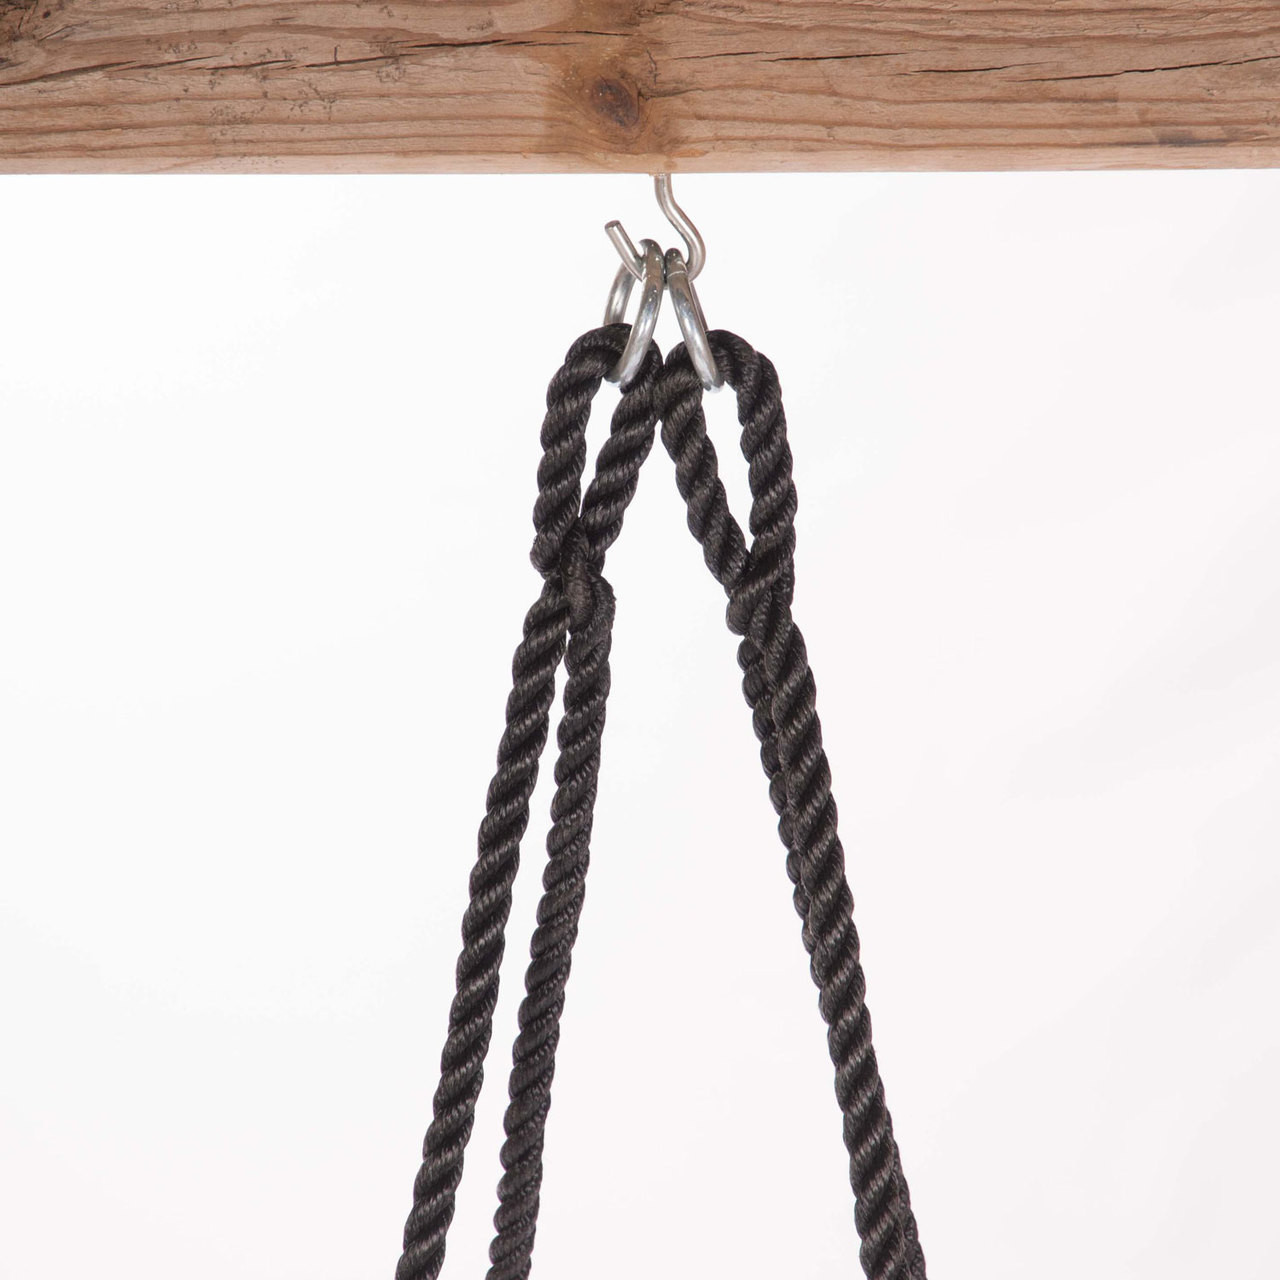 Web Riderz Web Swing - single-point hanging